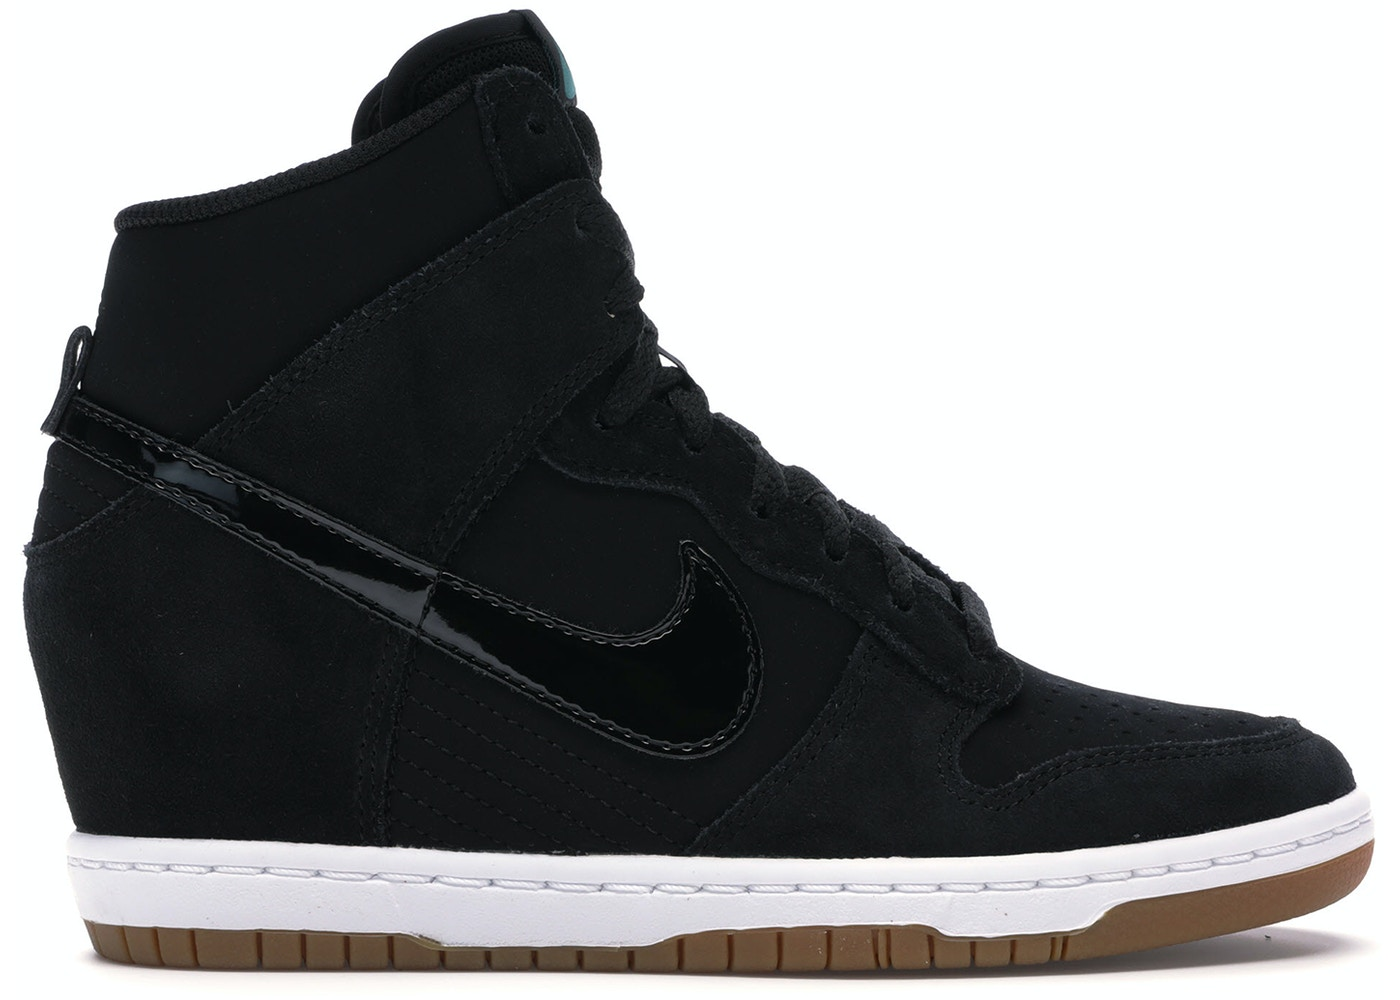 new product 8645f e9cb1 Nike Dunk Sky Hi Black Gum (W) - 644877-011